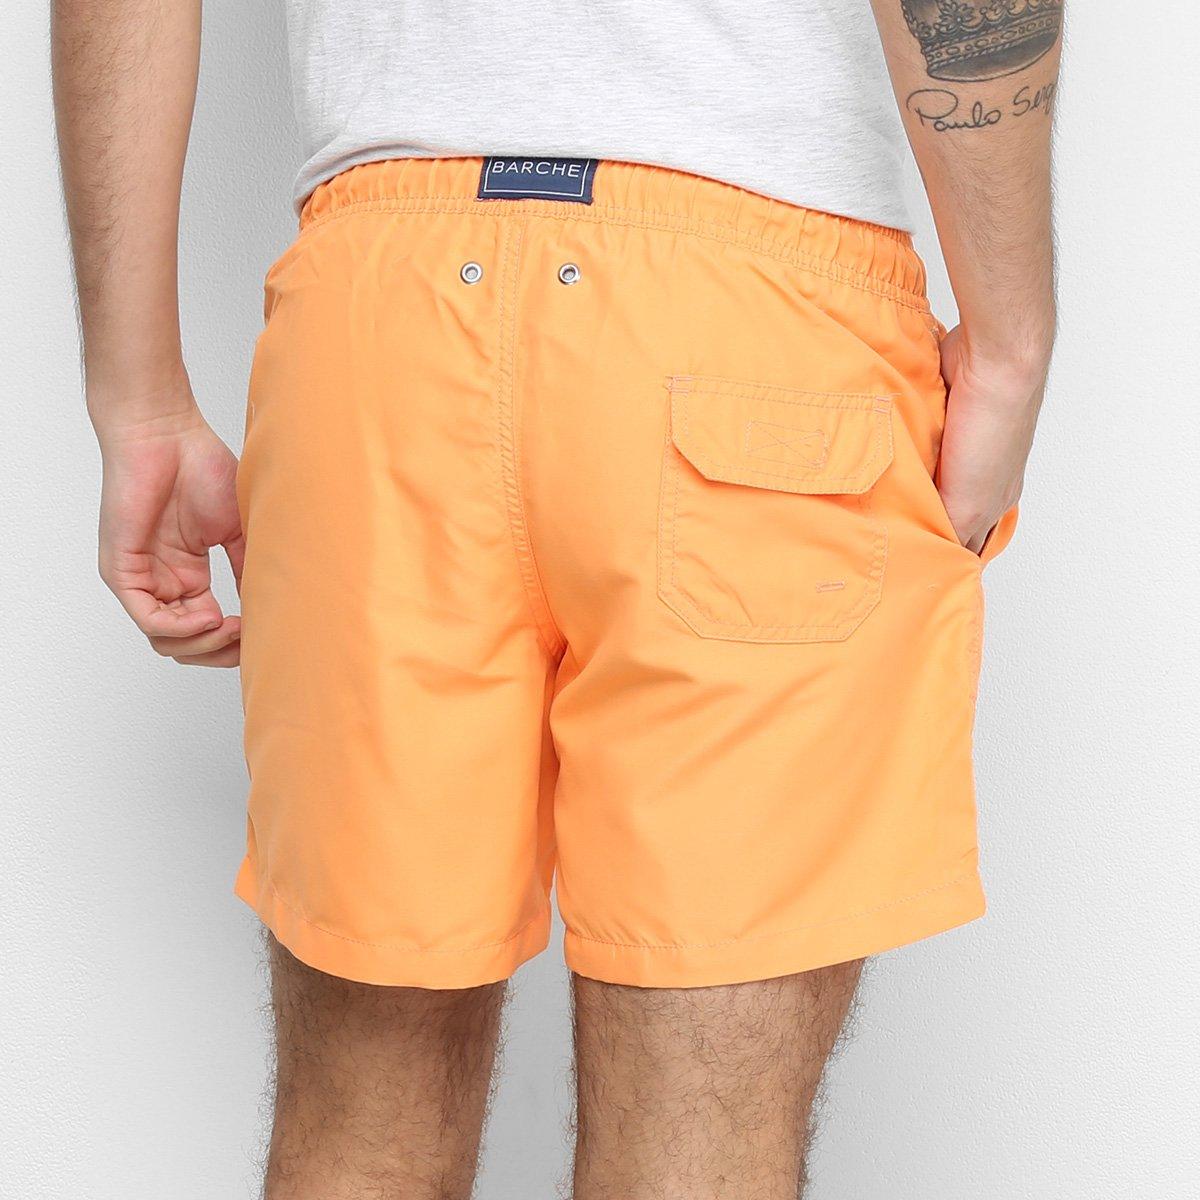 Shorts Barche Liso Masculino - Tam: G - 1